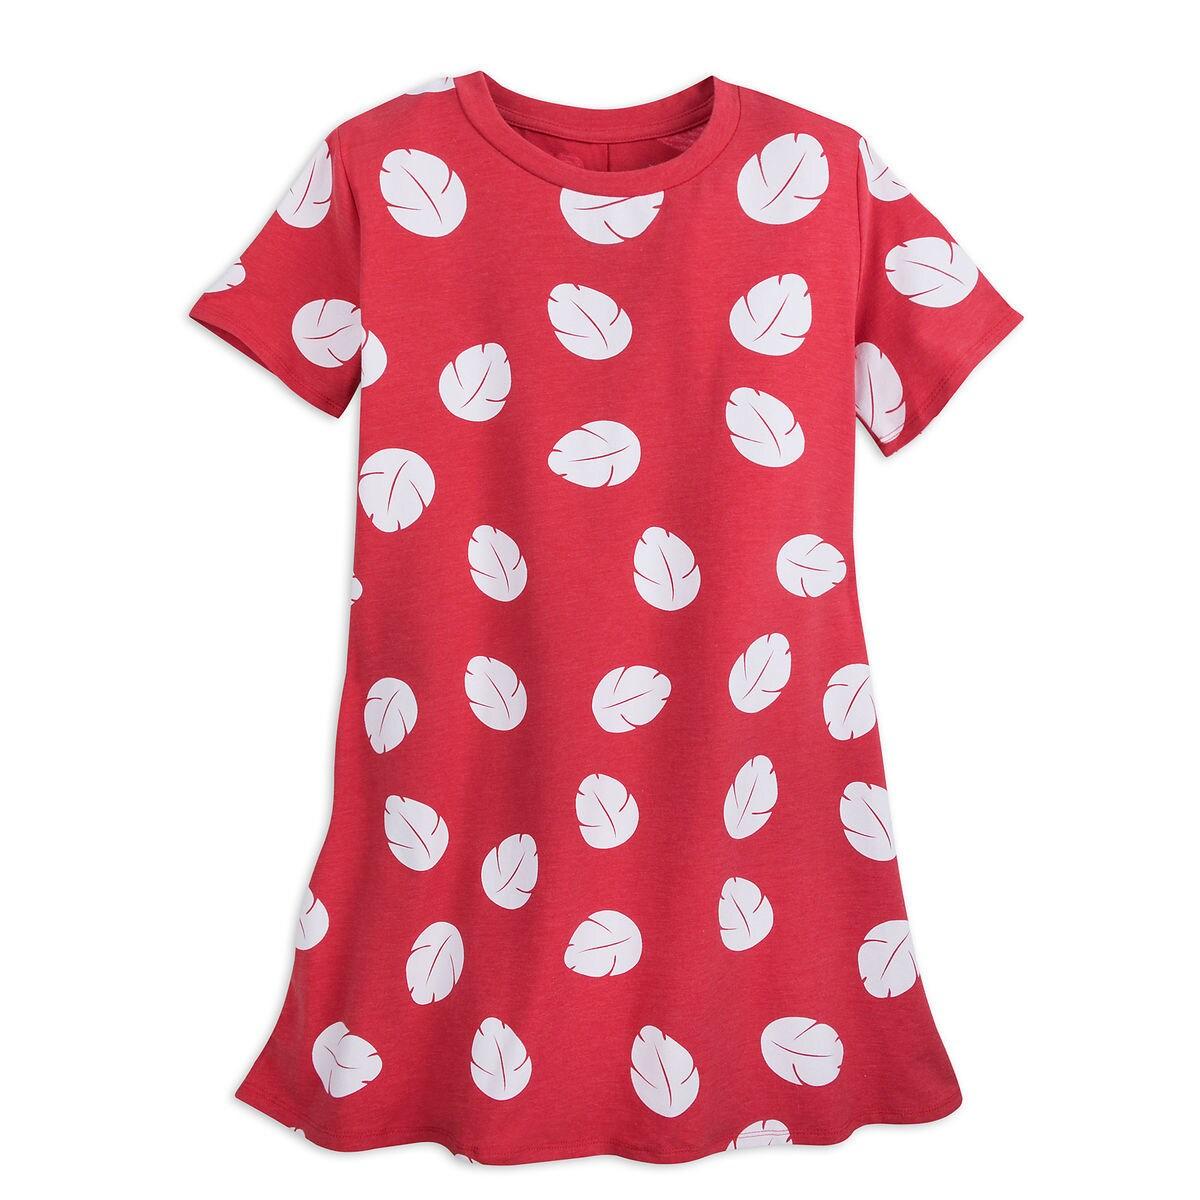 Lilo Shirt Dress For Women Oh My Disney Shopdisney